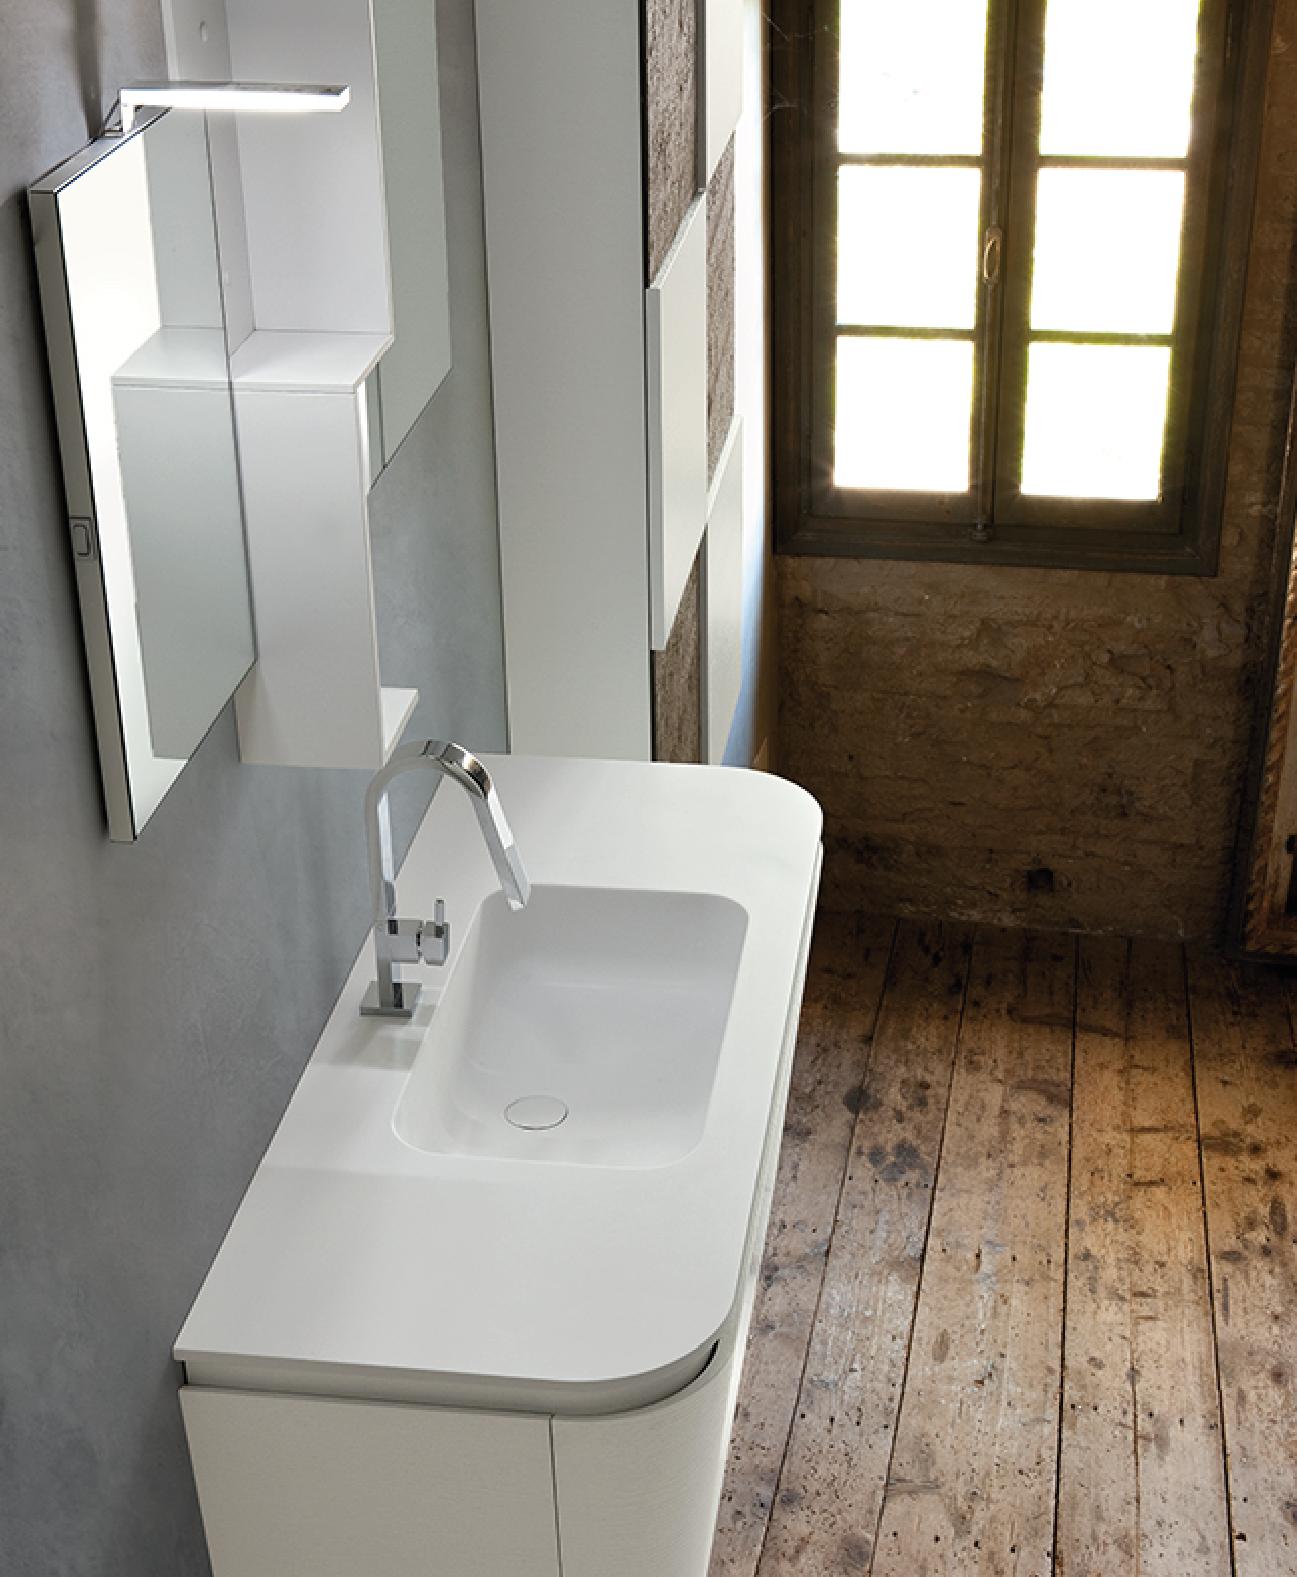 bathrooms-08.jpg